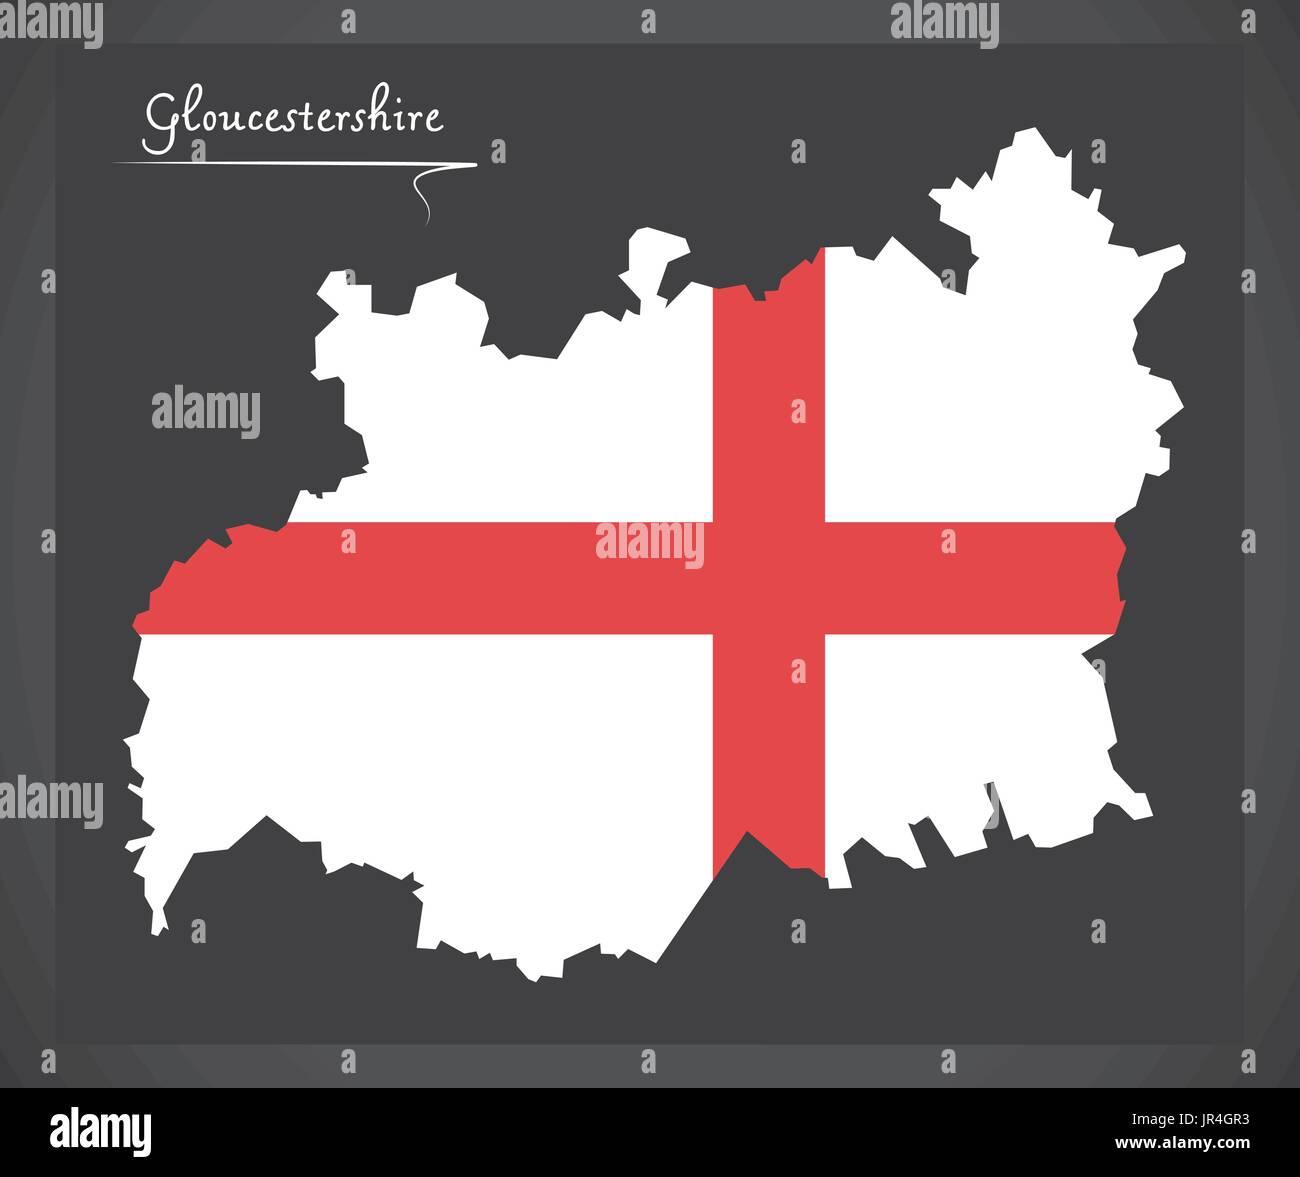 Gloucestershire map England UK with English national flag illustration - Stock Vector